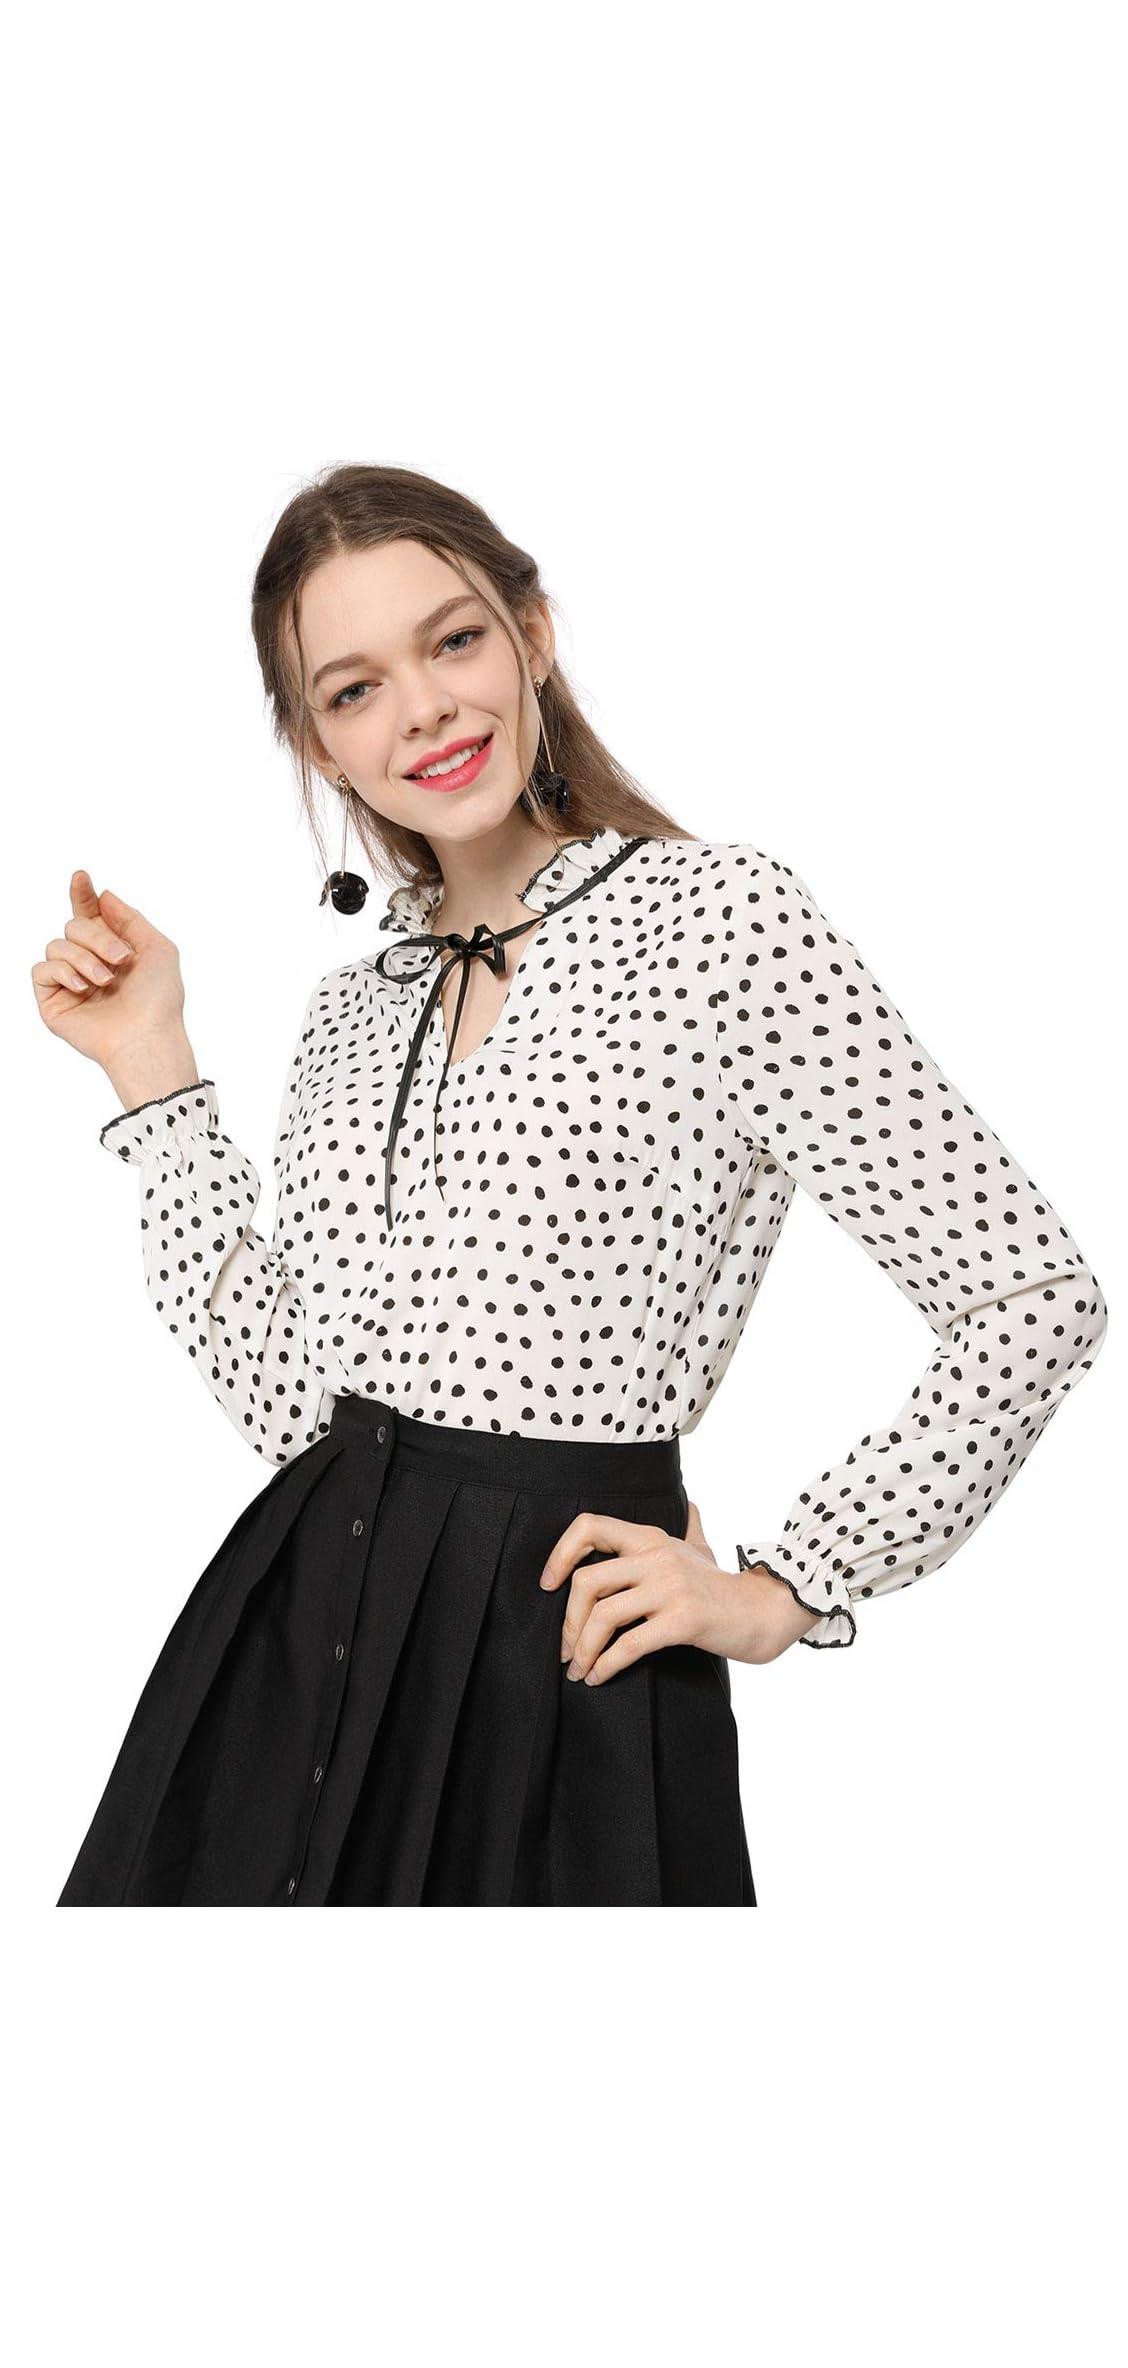 Women's Tie Ruffle Neck Polka Dot Blouse Vintage Bell